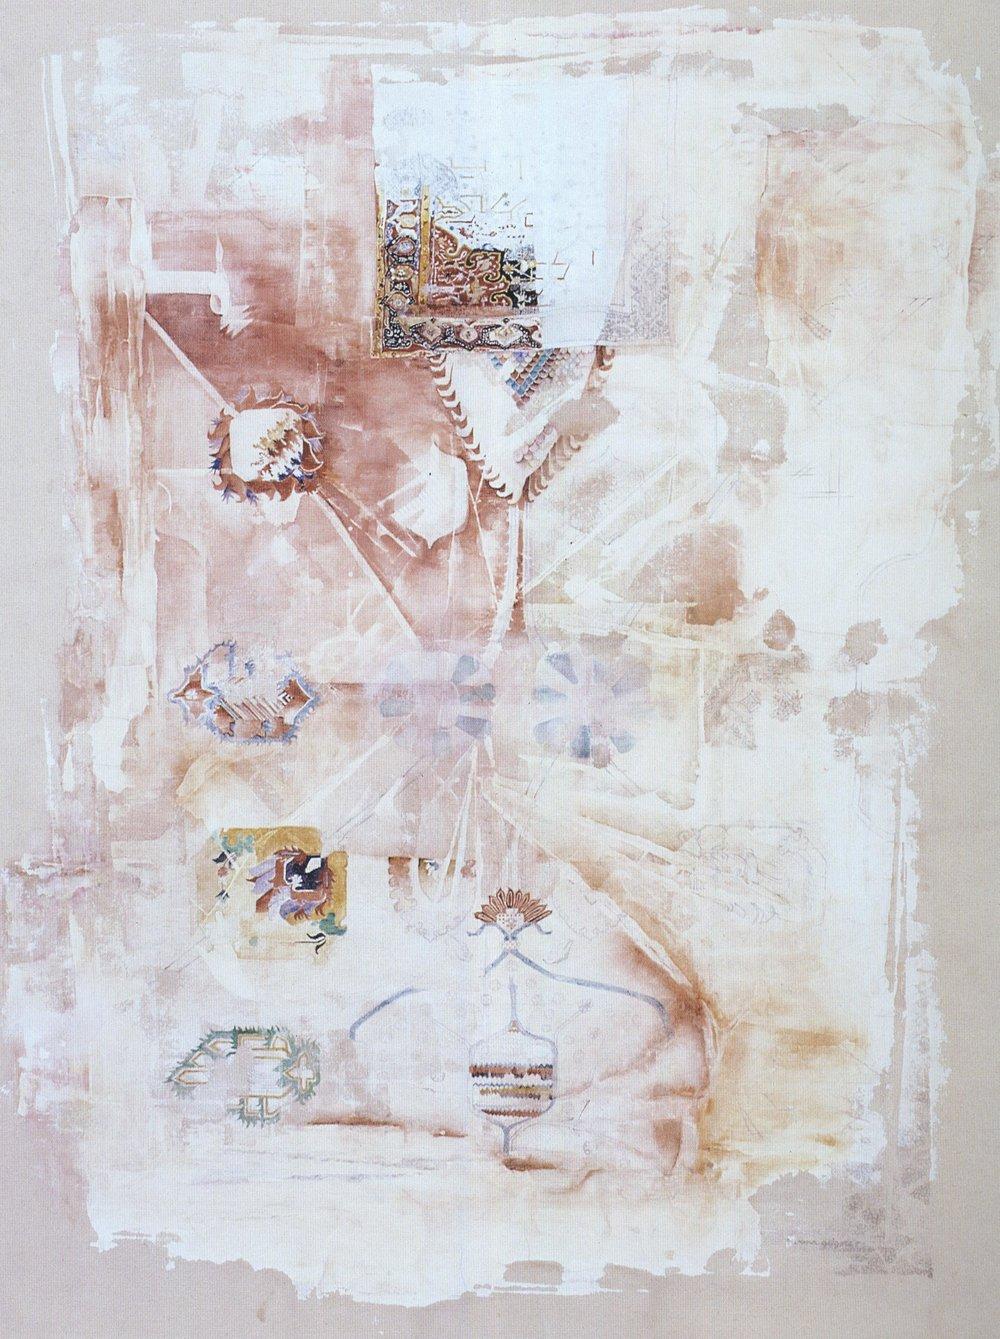 Mogul Fragmentation, Series #2